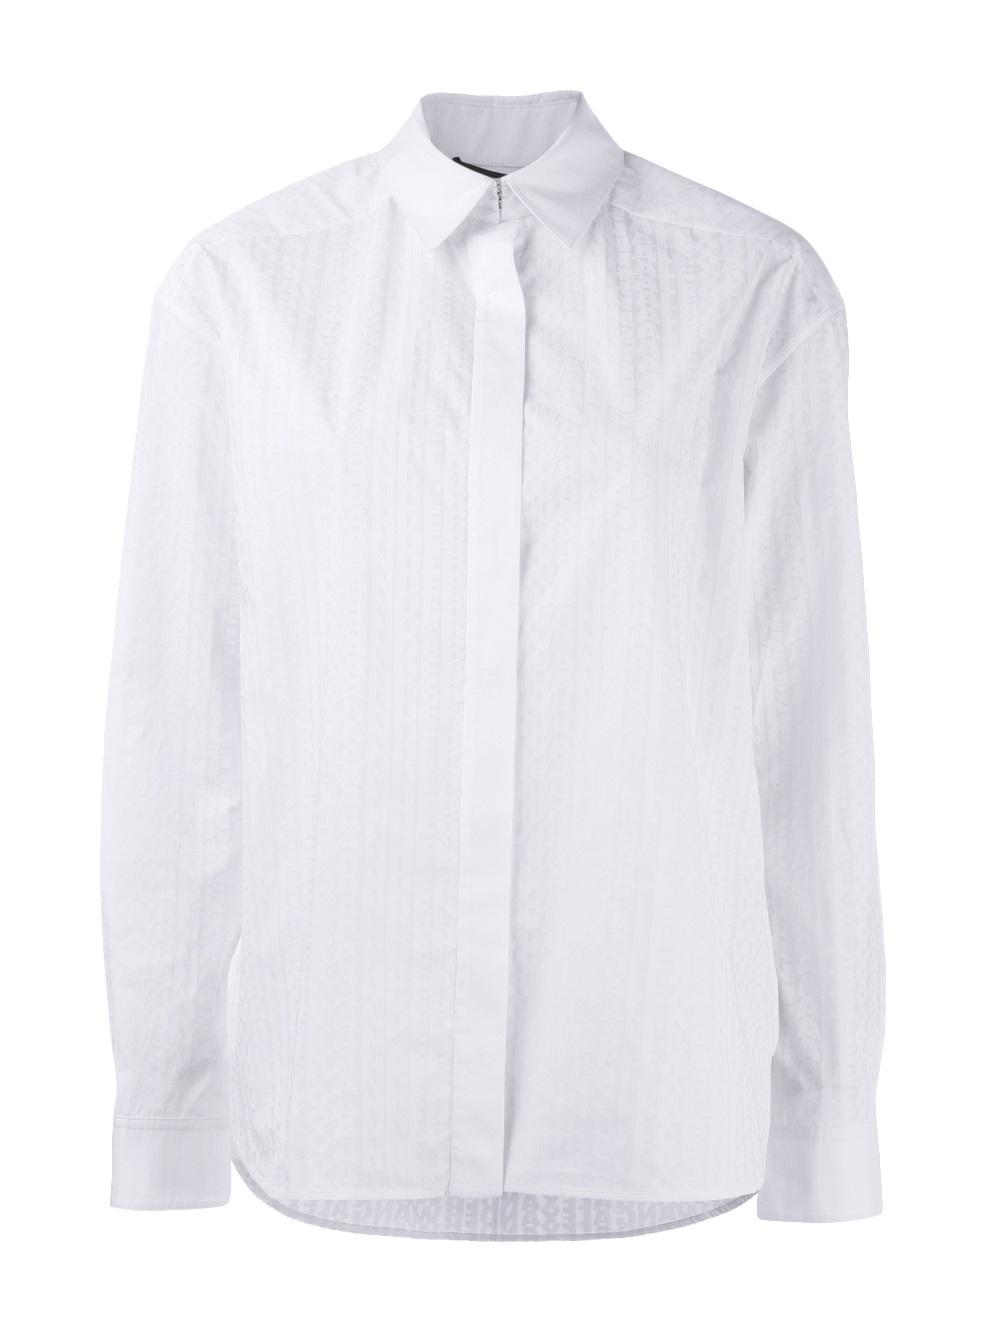 White Mens Dress Shirt